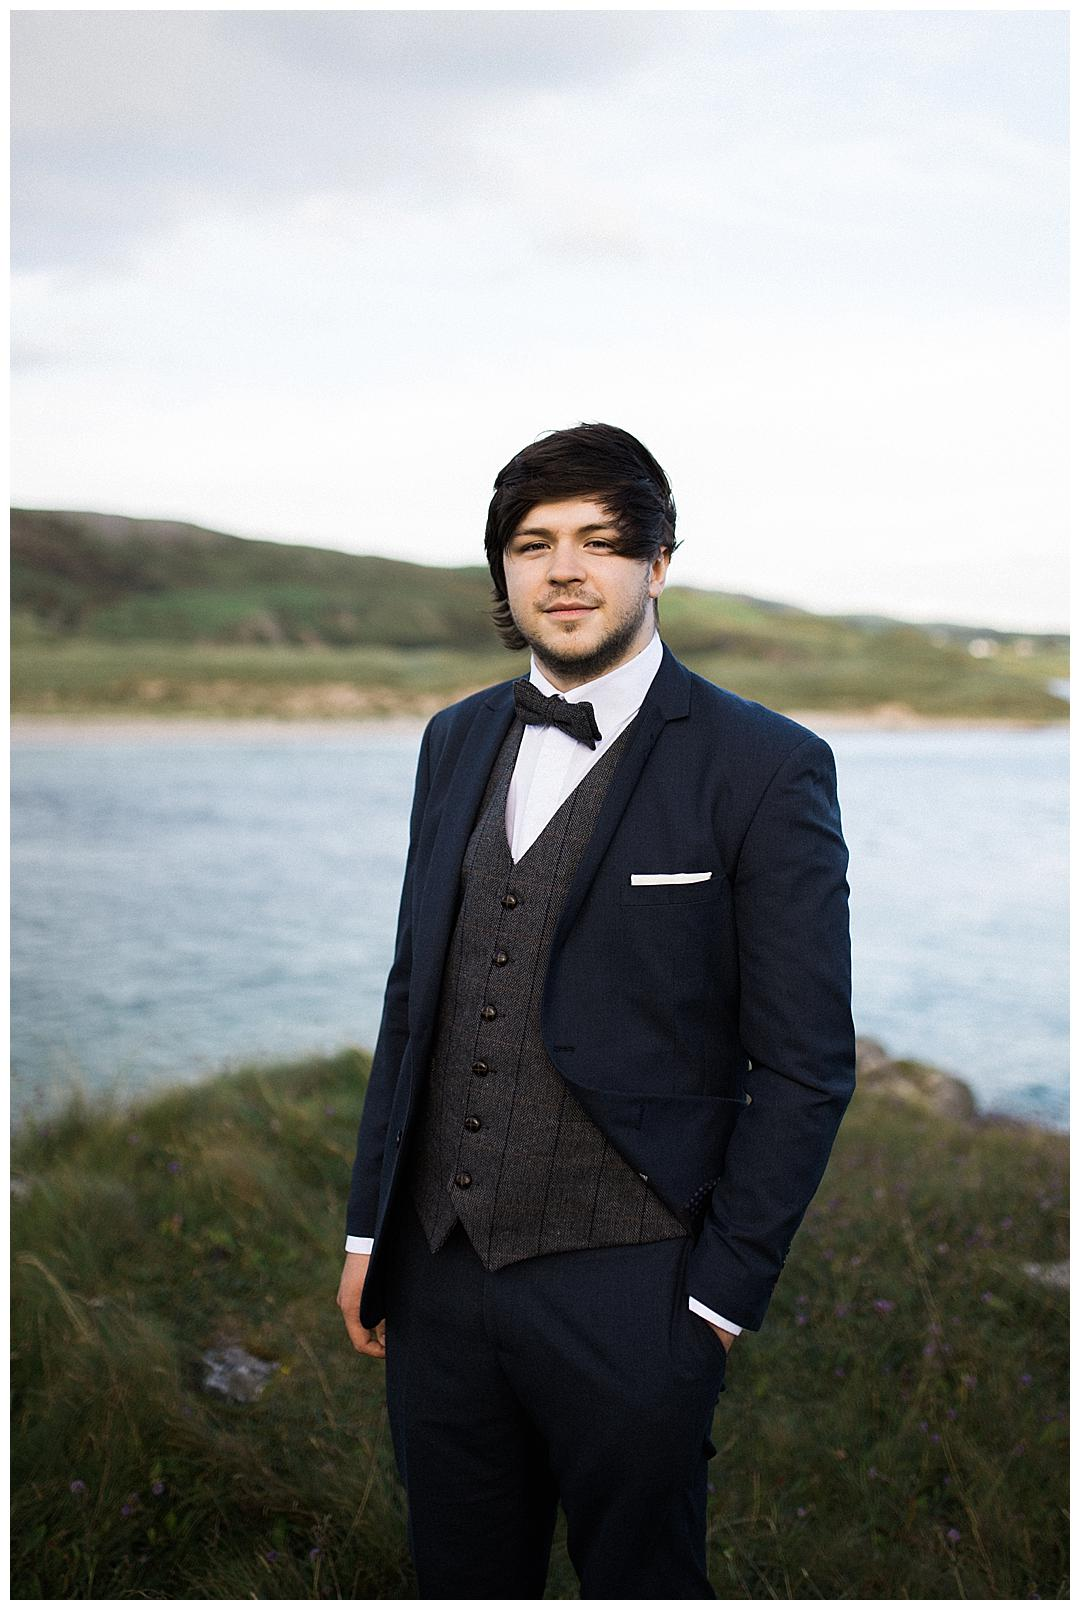 We_can _be_Heroes_alternative_wedding_photographer_Ireland_0082